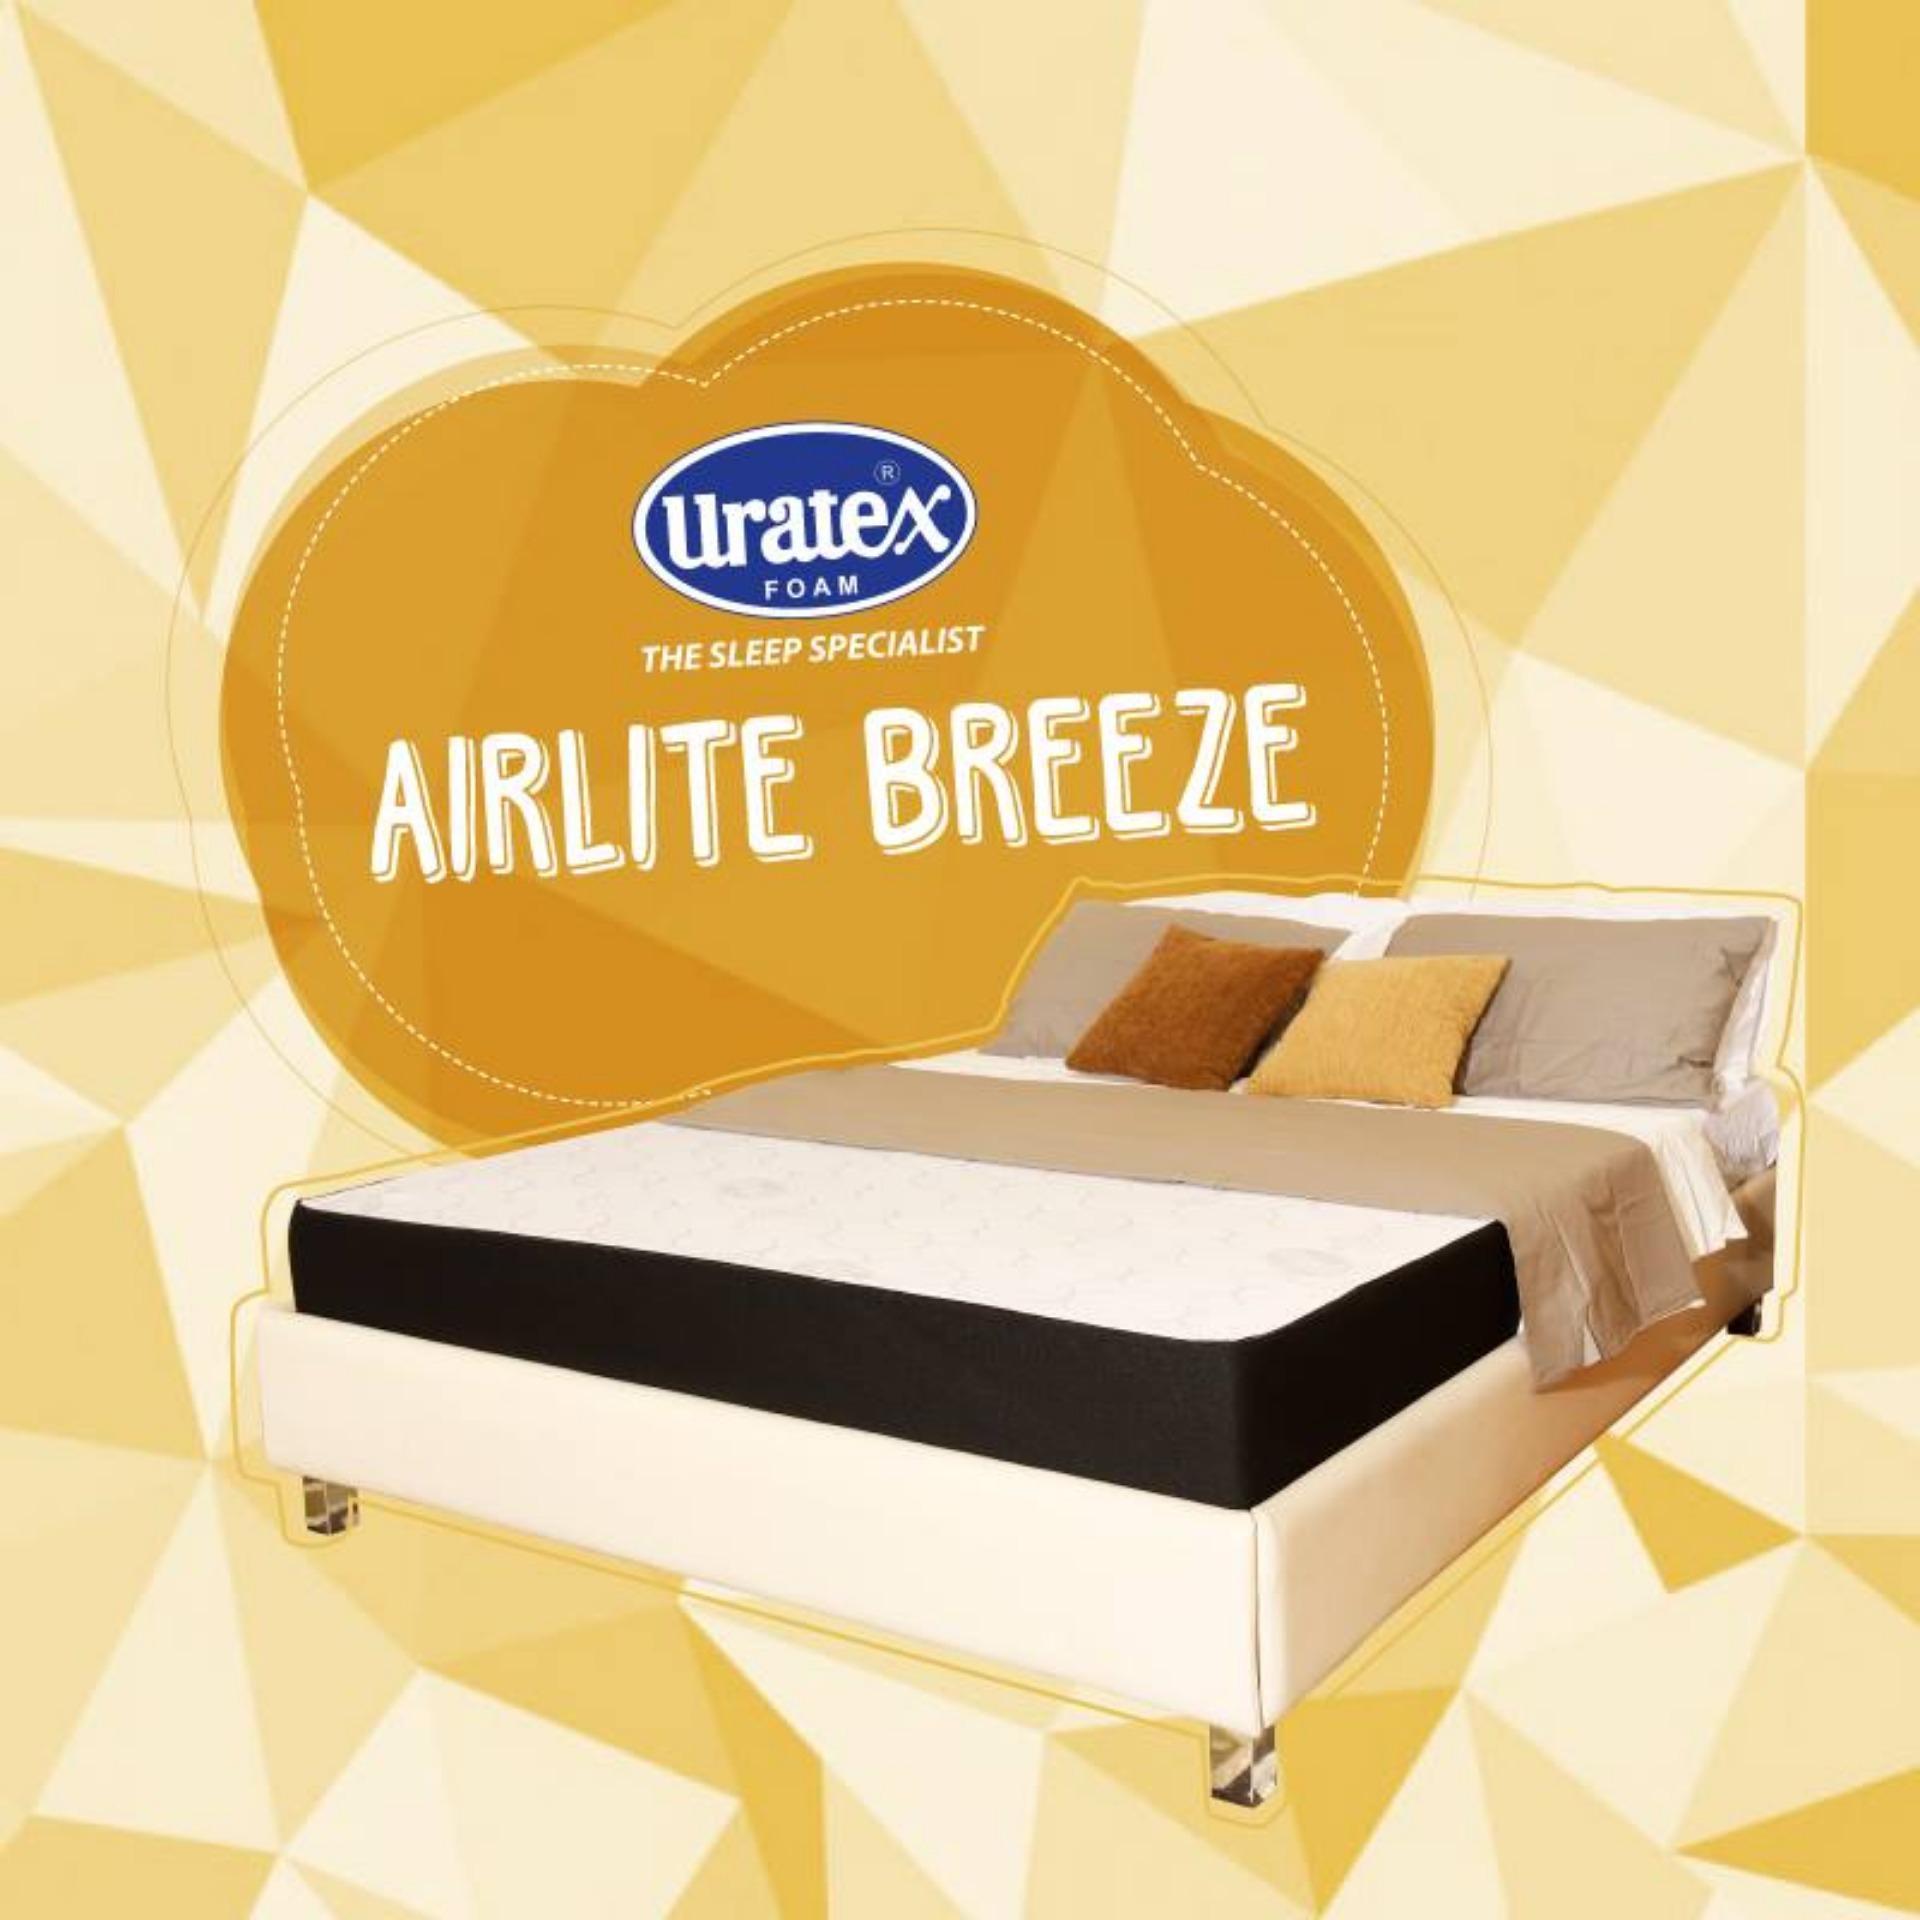 Crib mattress for sale philippines - Uratex Airlite Mattress Breeze 6x60x75 Blue